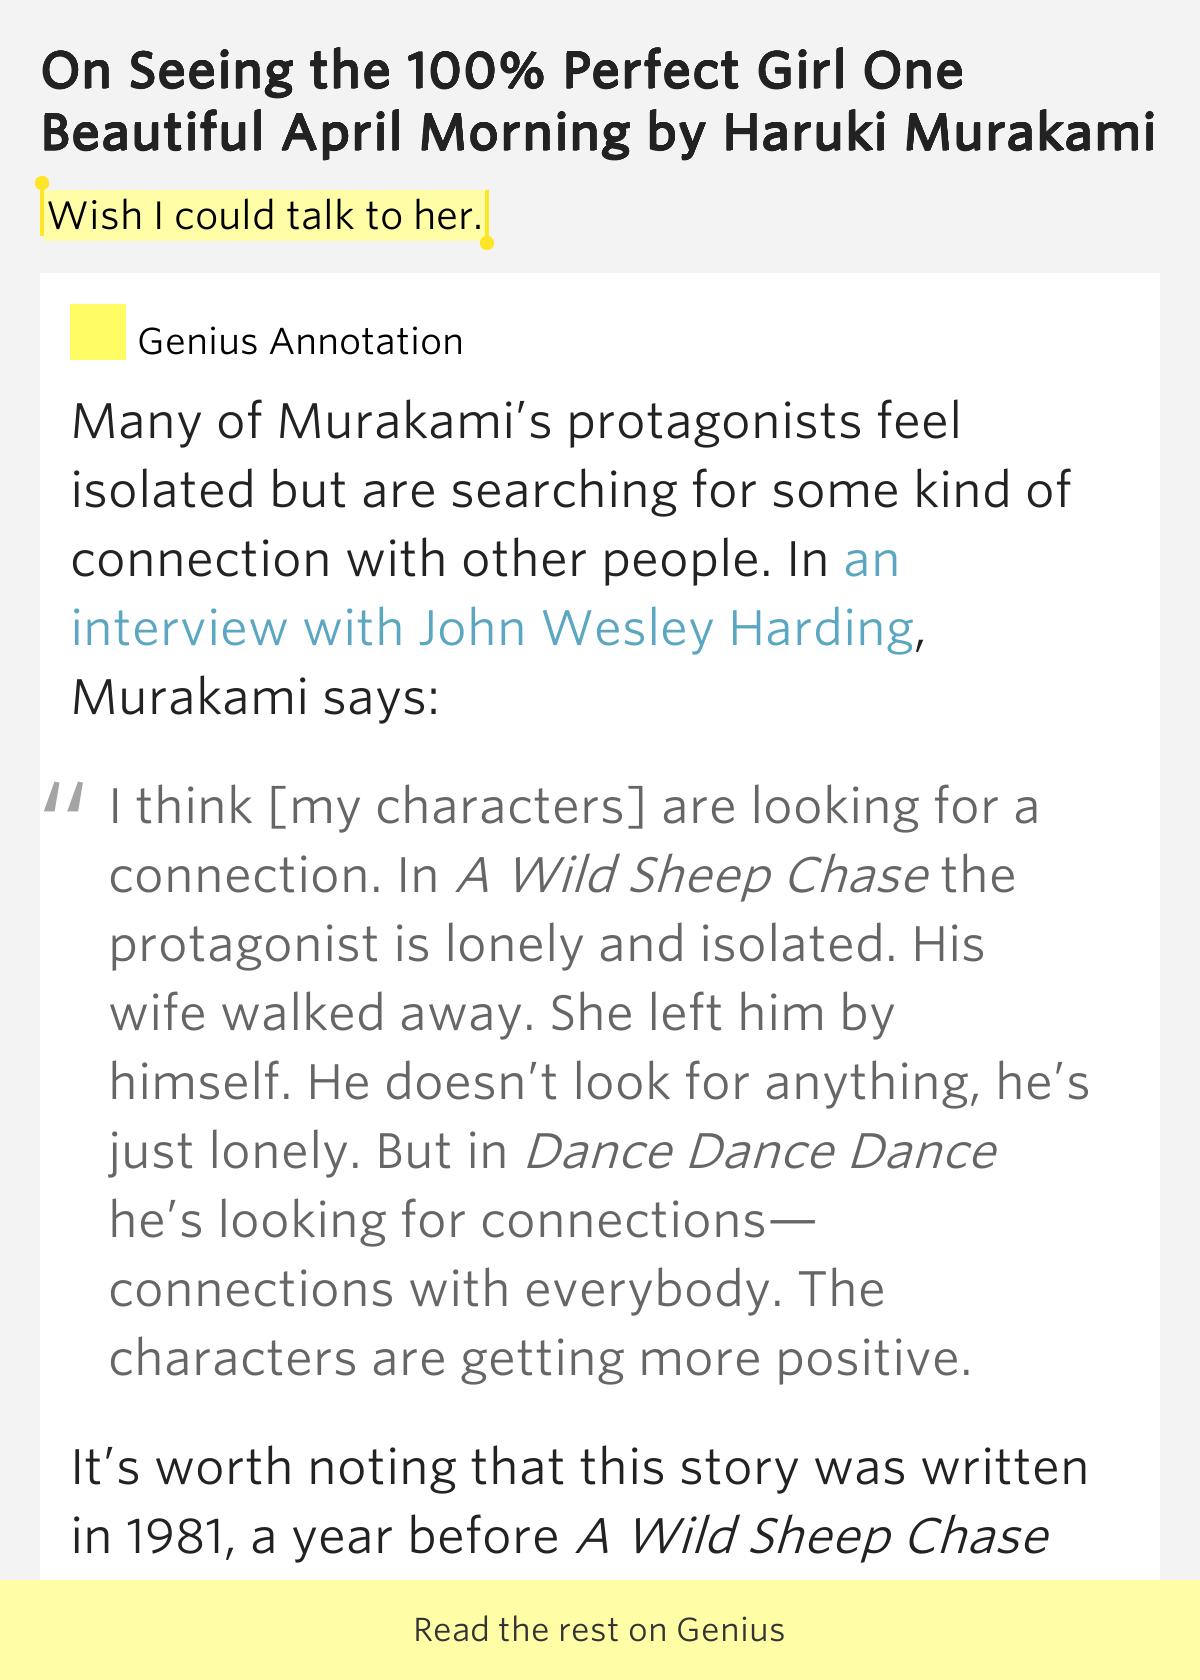 haruki murakami on seeing the 100 perfect girl essay Haruki murakami 'on seeing the 100% perfect gril one murakami etc which have garnered critical on seeing the 100% perfect girl one beautiful april morning.